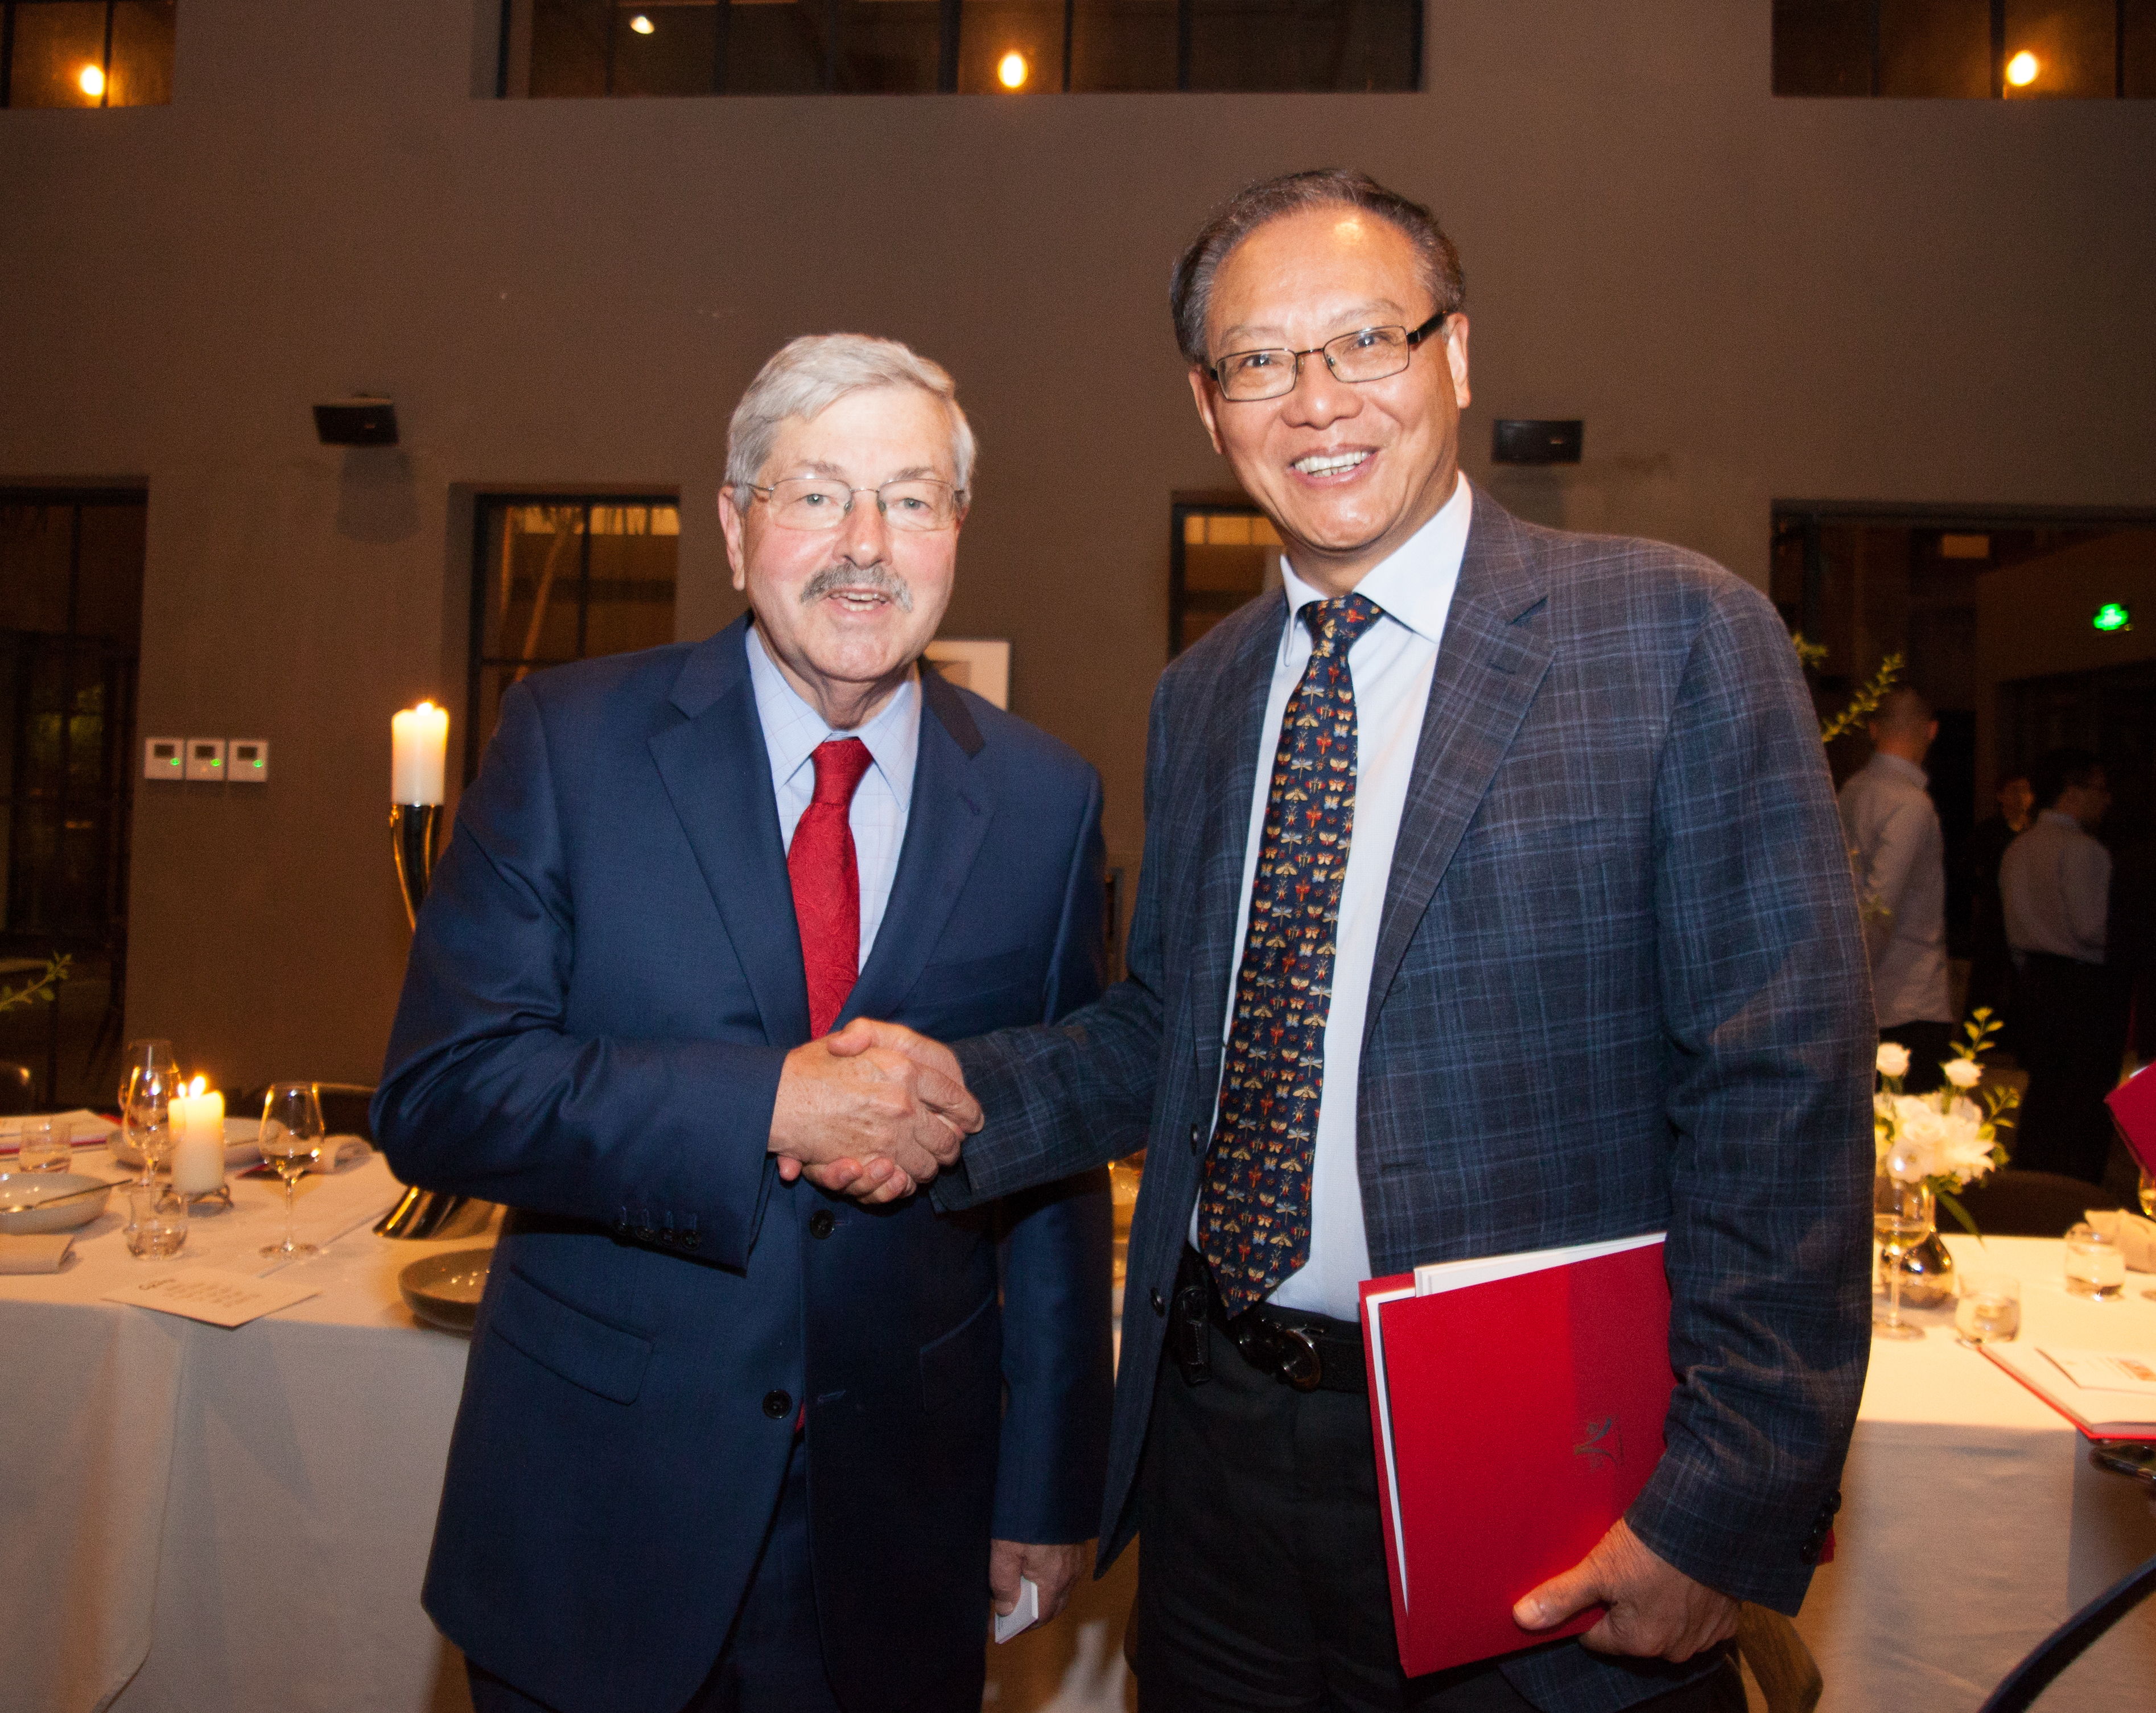 Howard Li and Ambassador Branstad shaking hands 1